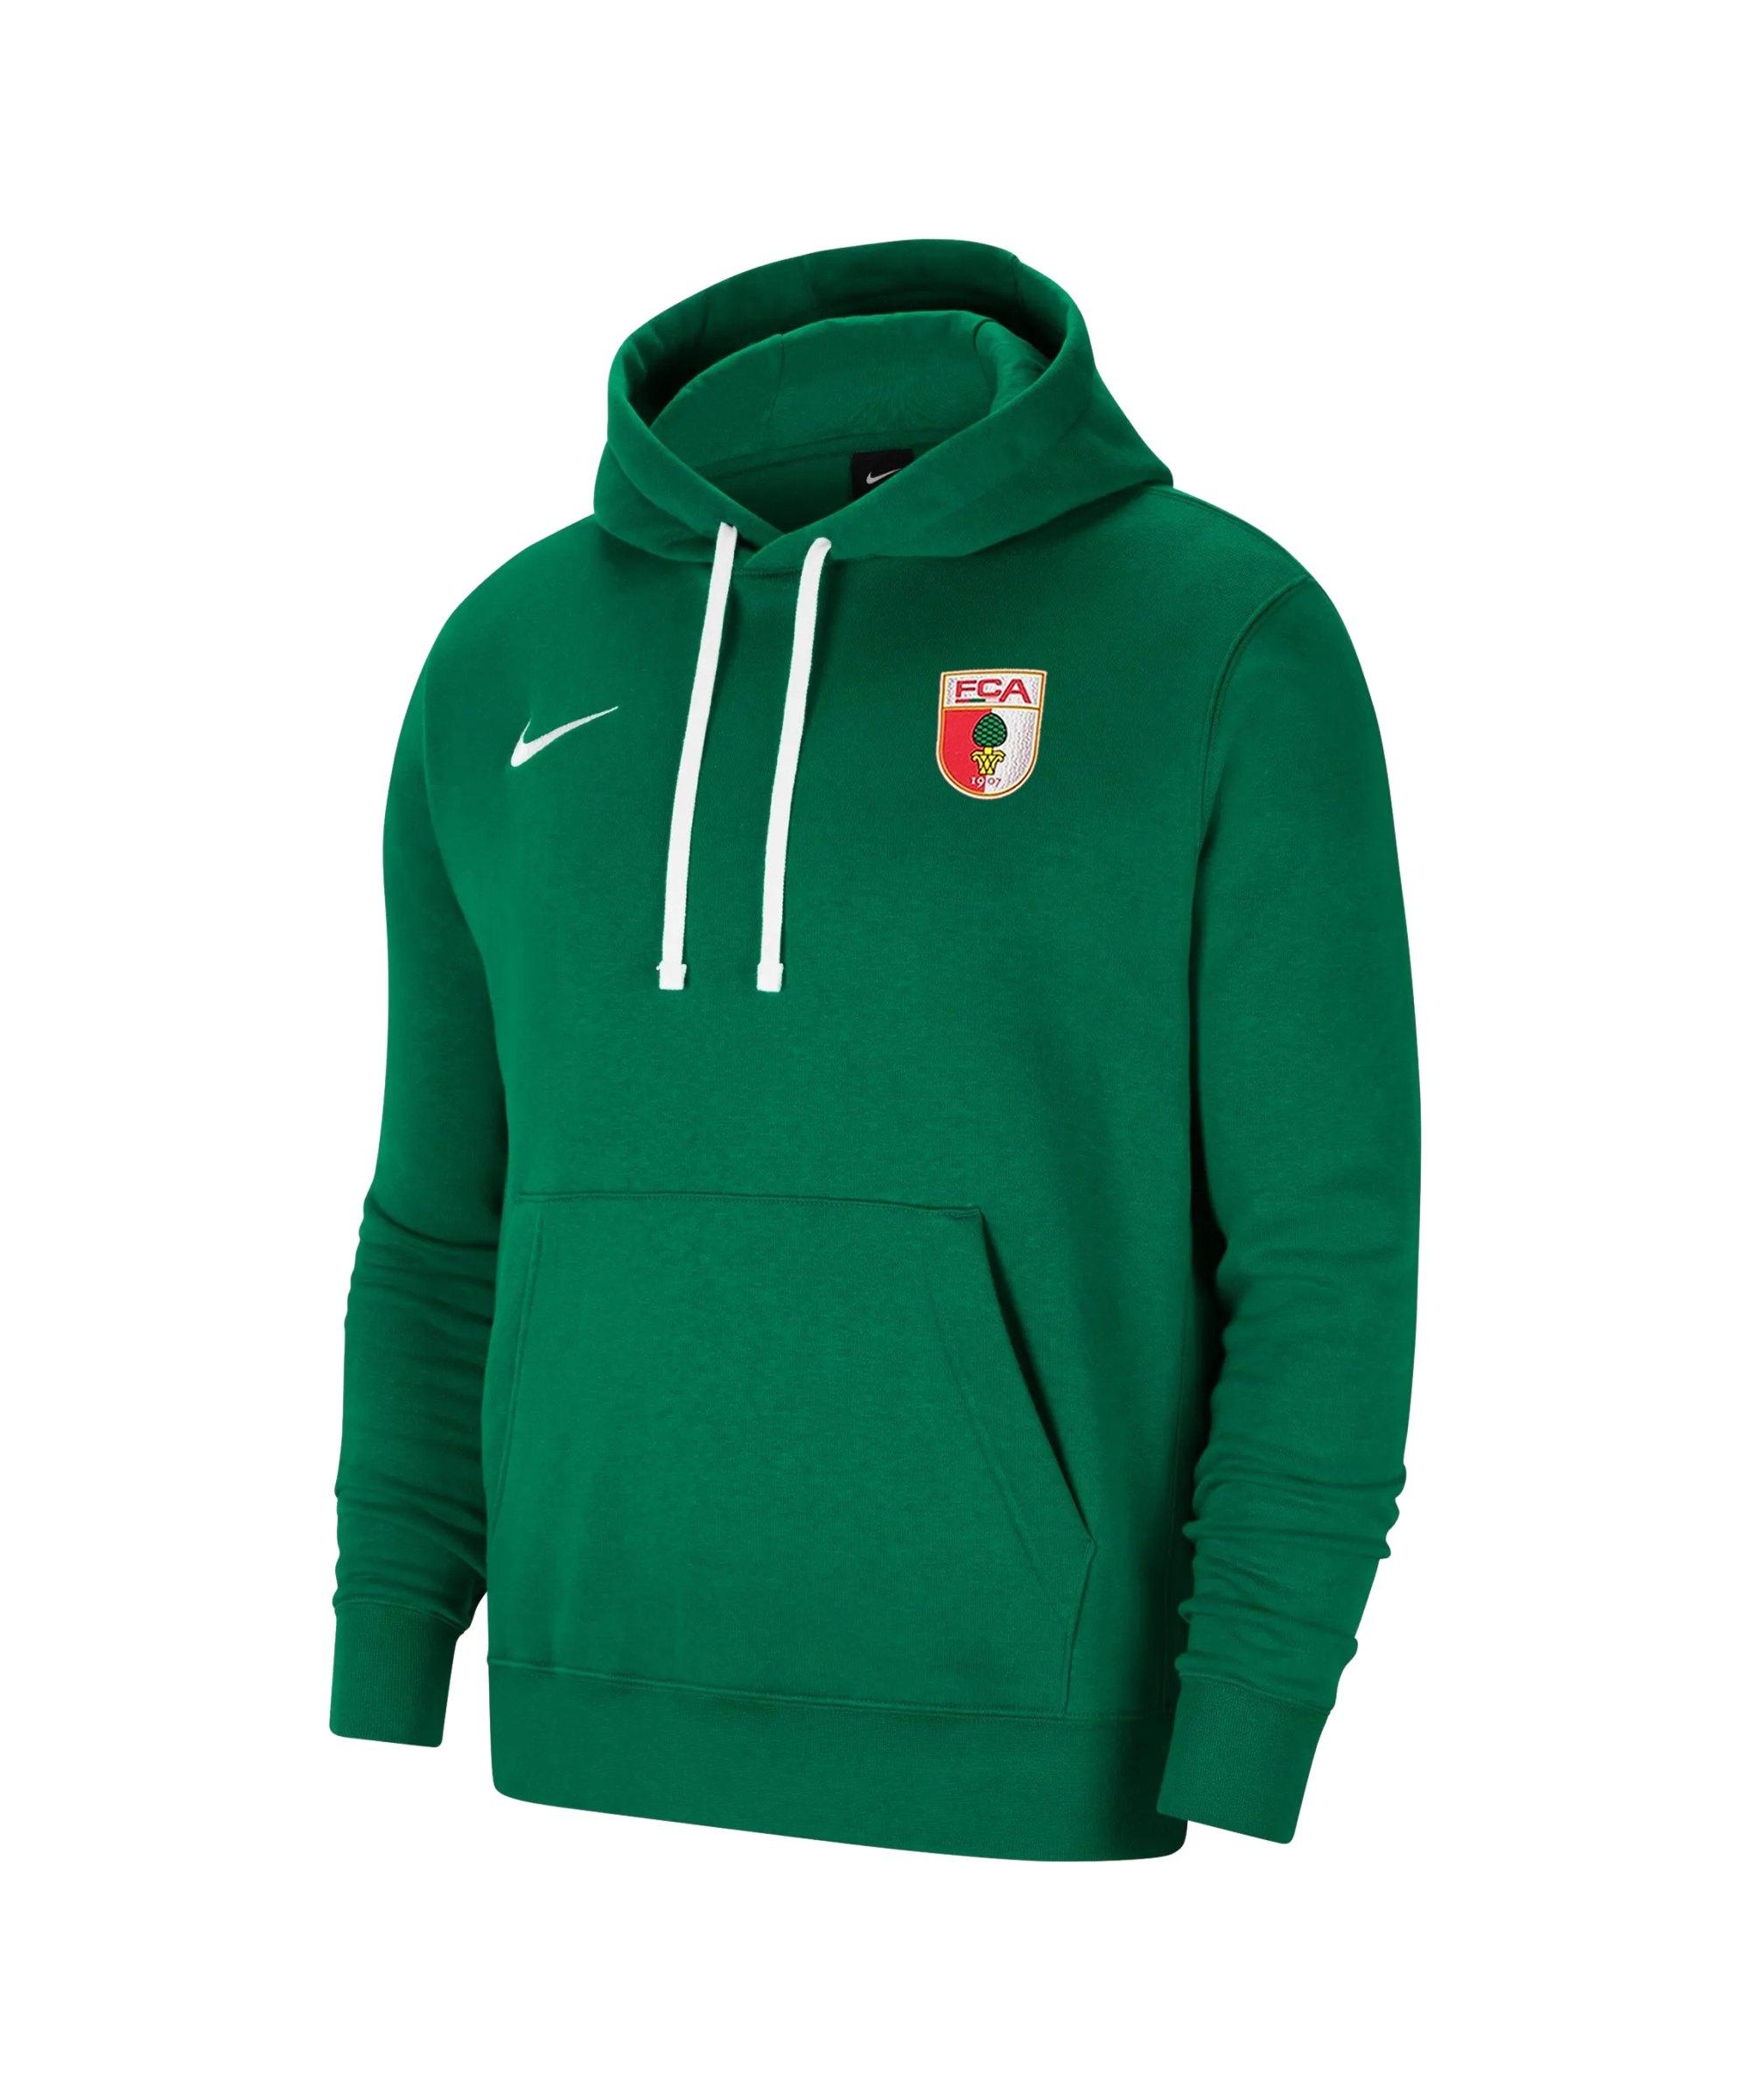 Nike FC Augsburg Fleece Hoody Grün F302 - gruen